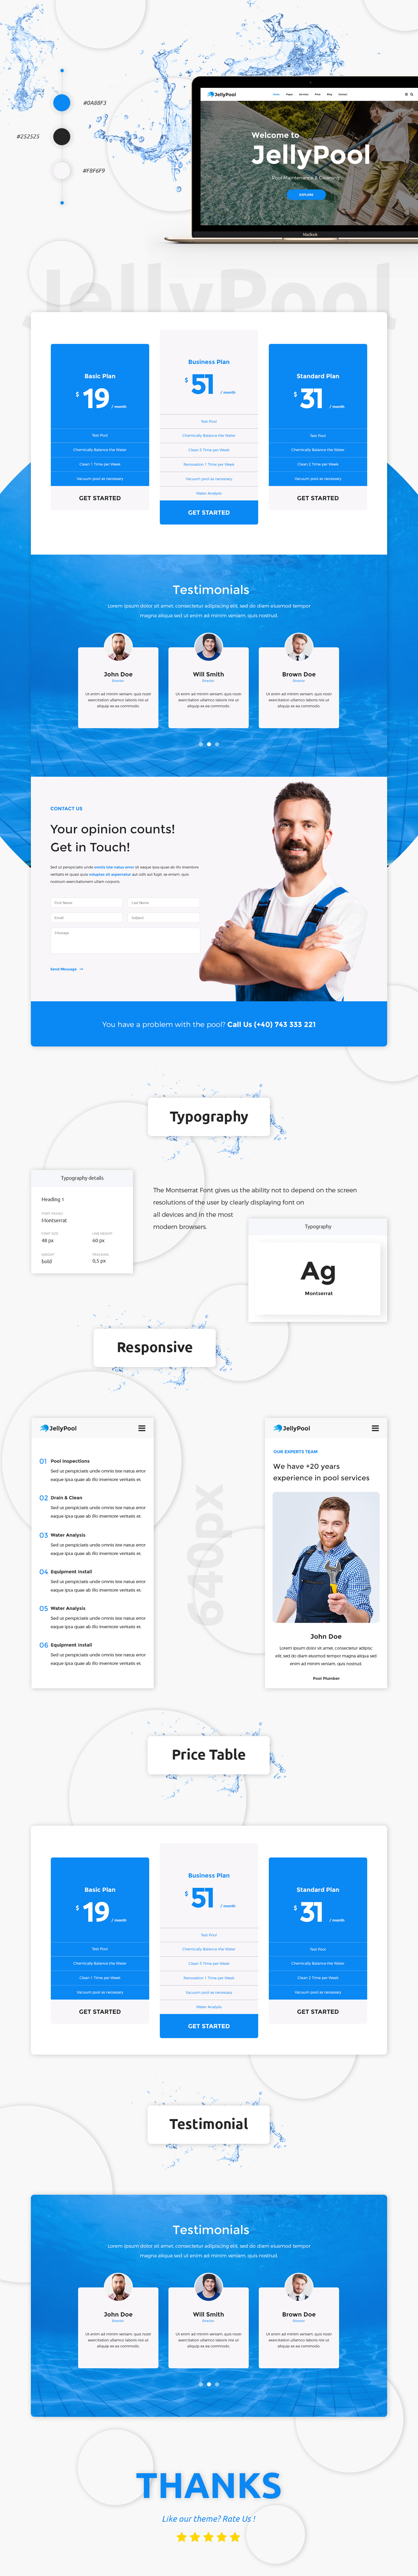 JellyPool - Pool Maintenance & Cleaning WordPress Theme - 2